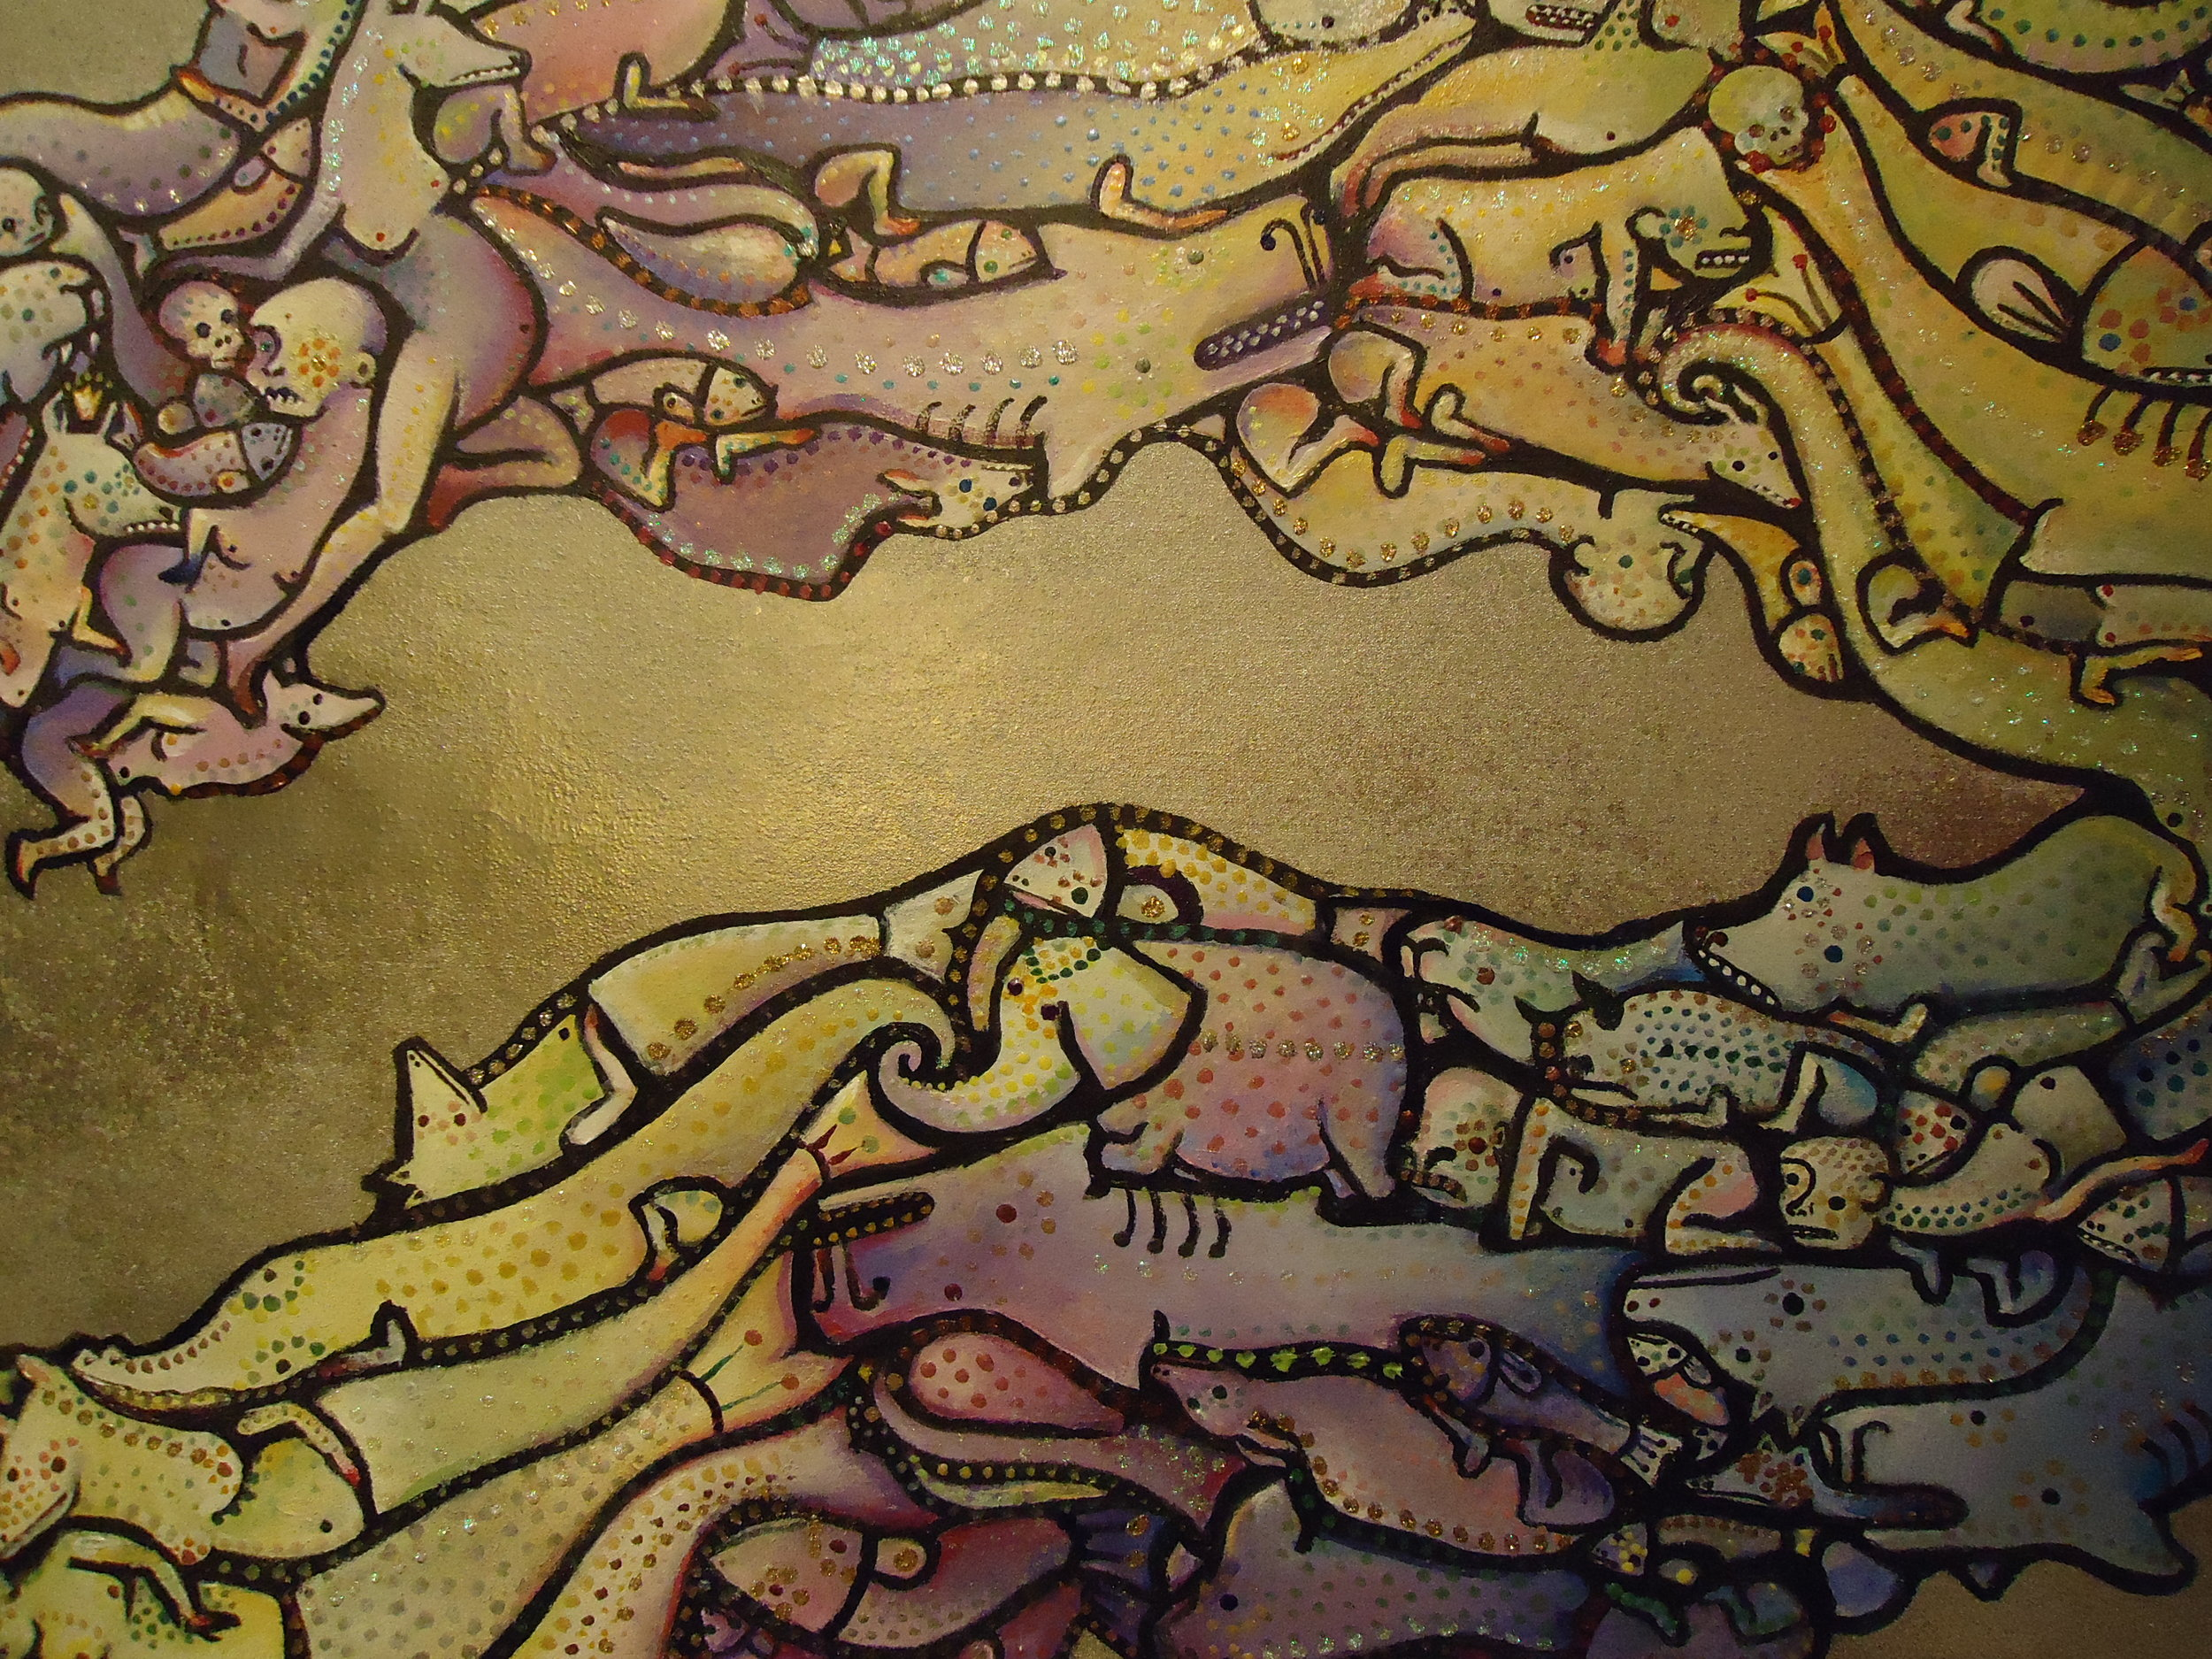 animal-art-colorful-jason-borders.jpg